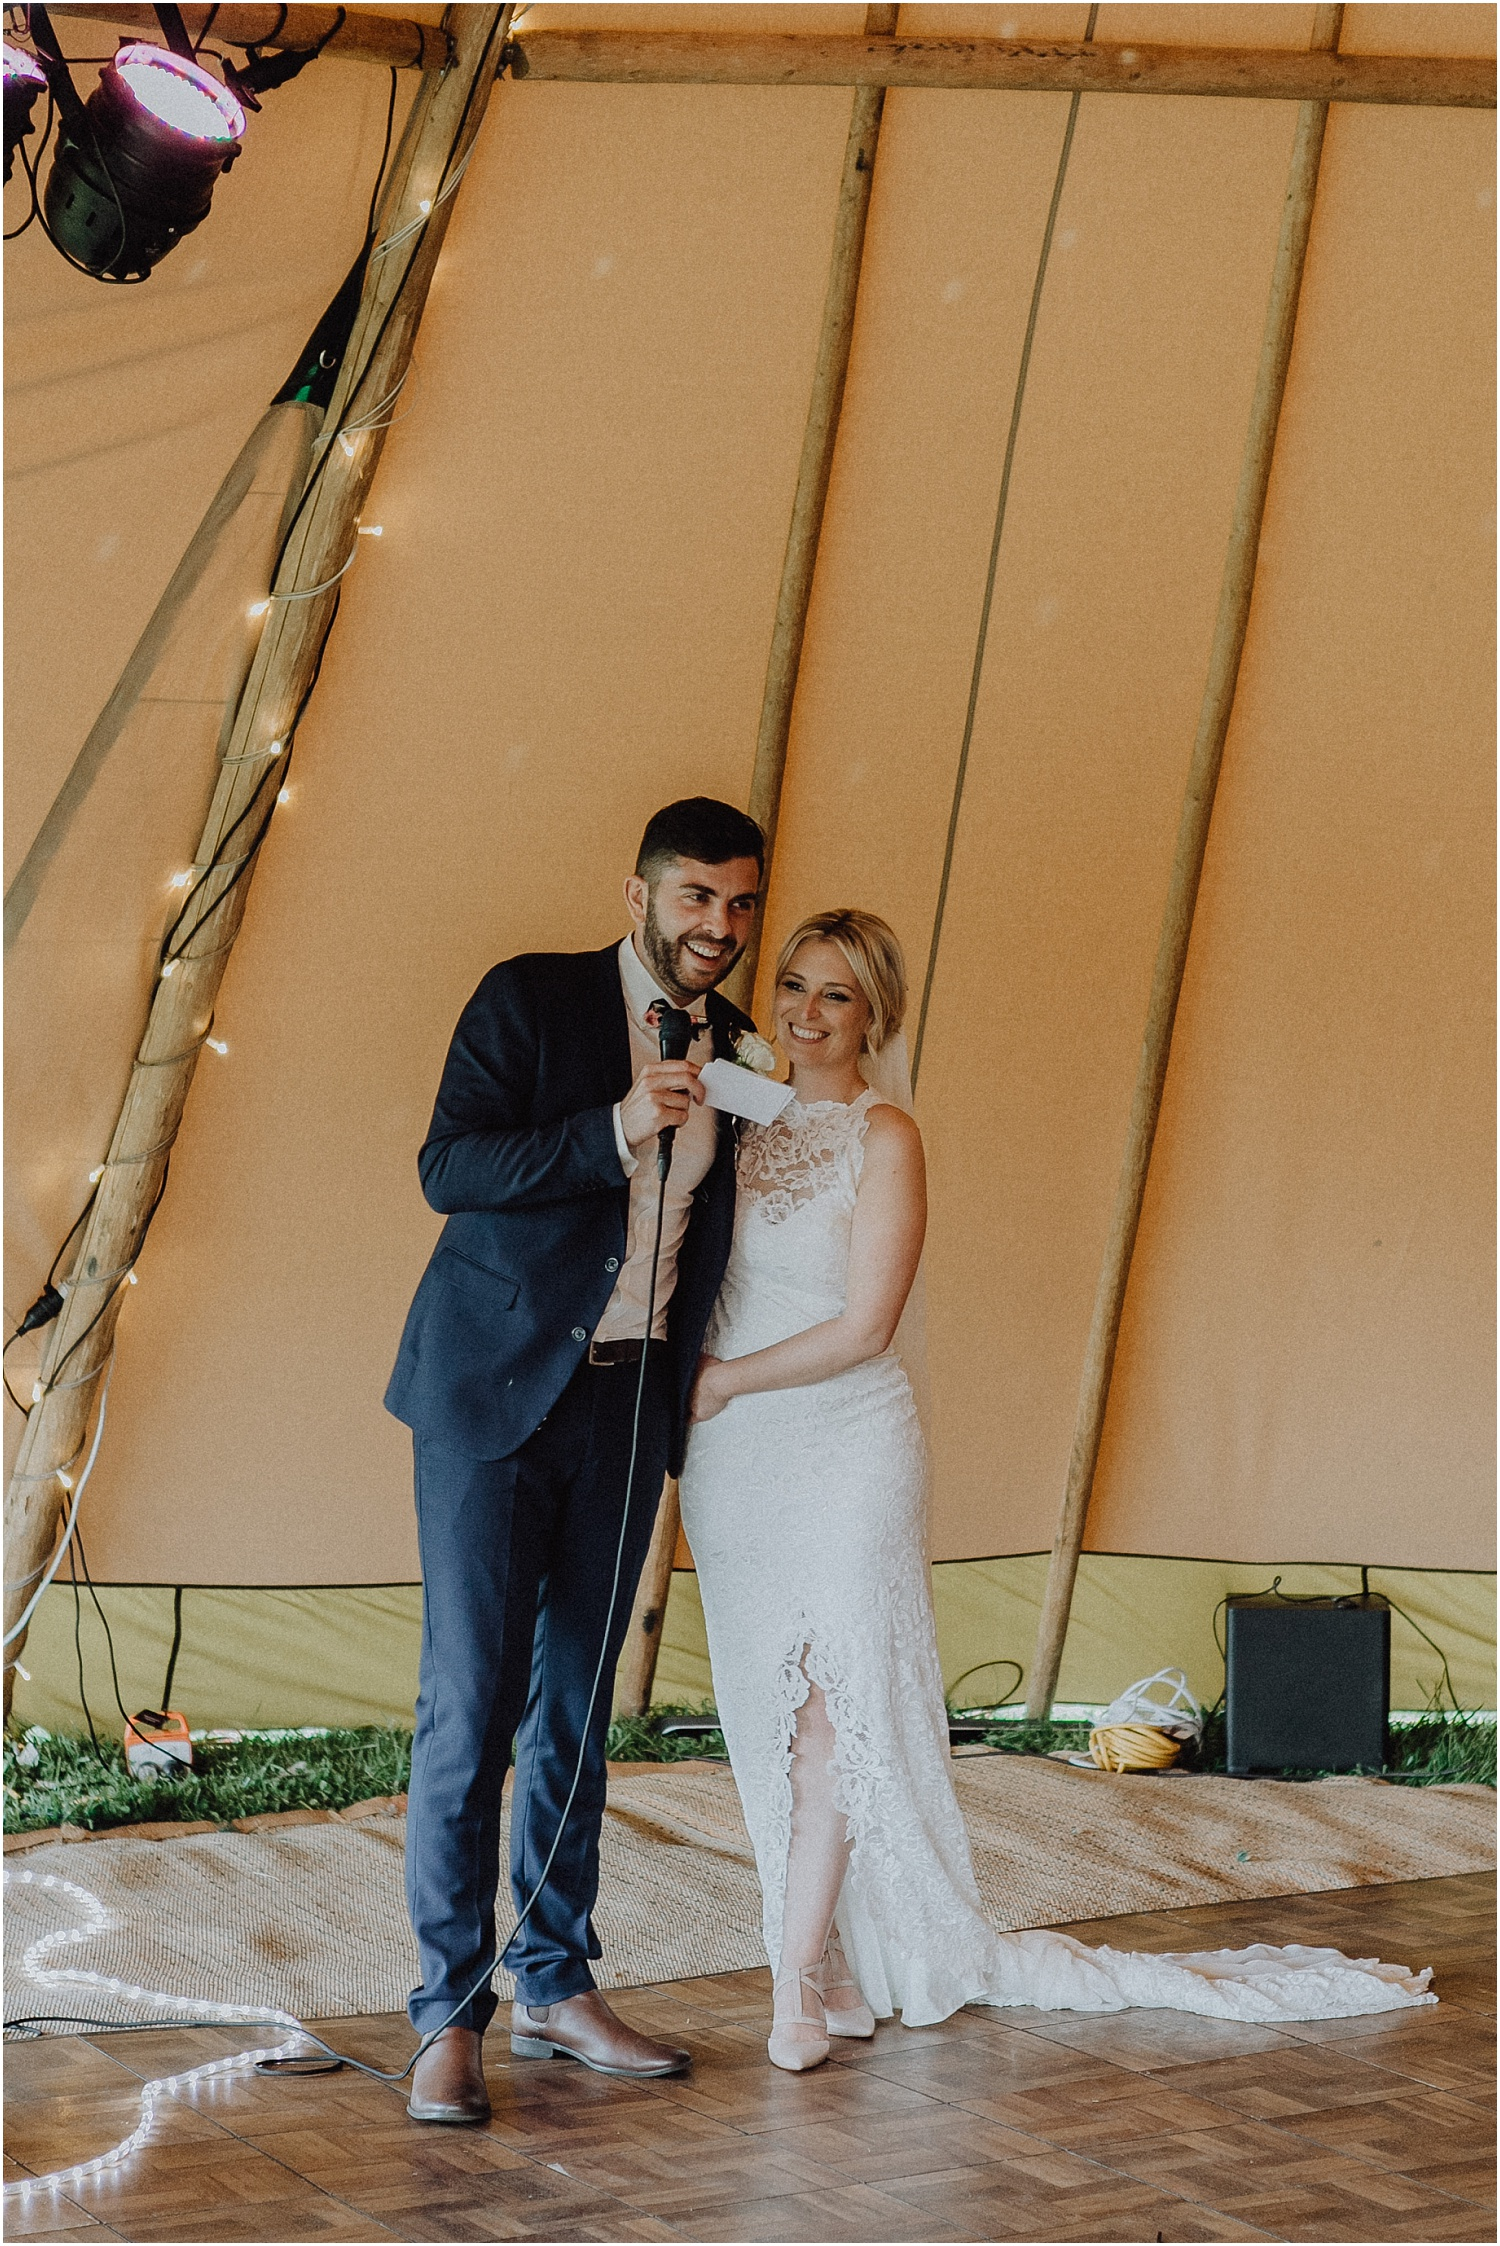 Nicolle and Damien's tipi wedding at the Flinders Yacht Club on the Mornington Peninsula._0174.jpg